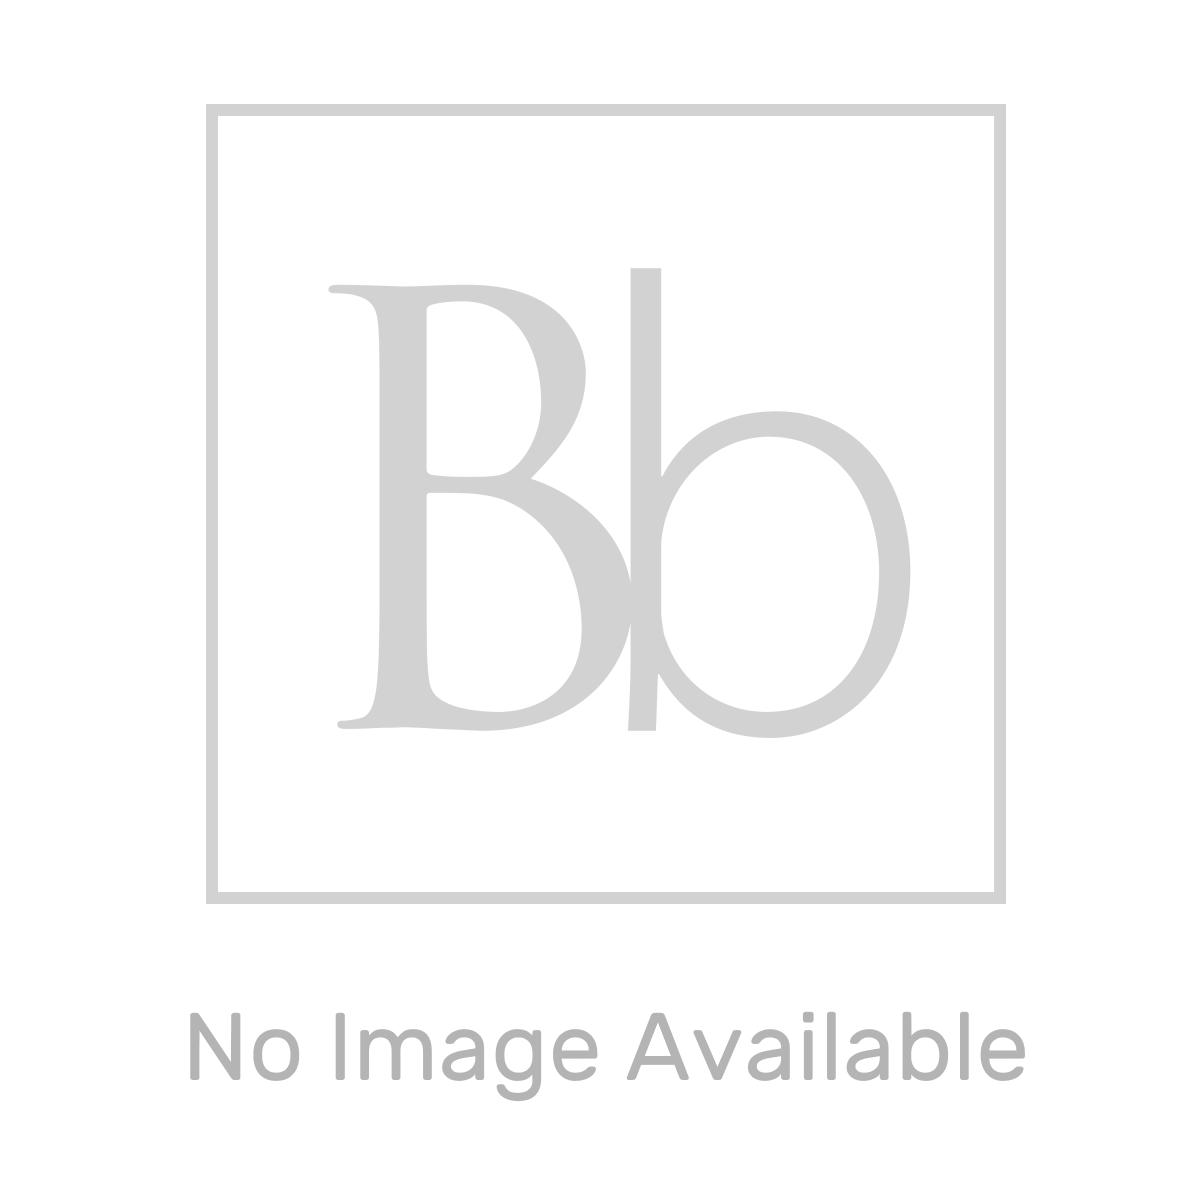 RAK Moon Black Mini Mono Basin Mixer Tap with Waste Measurements